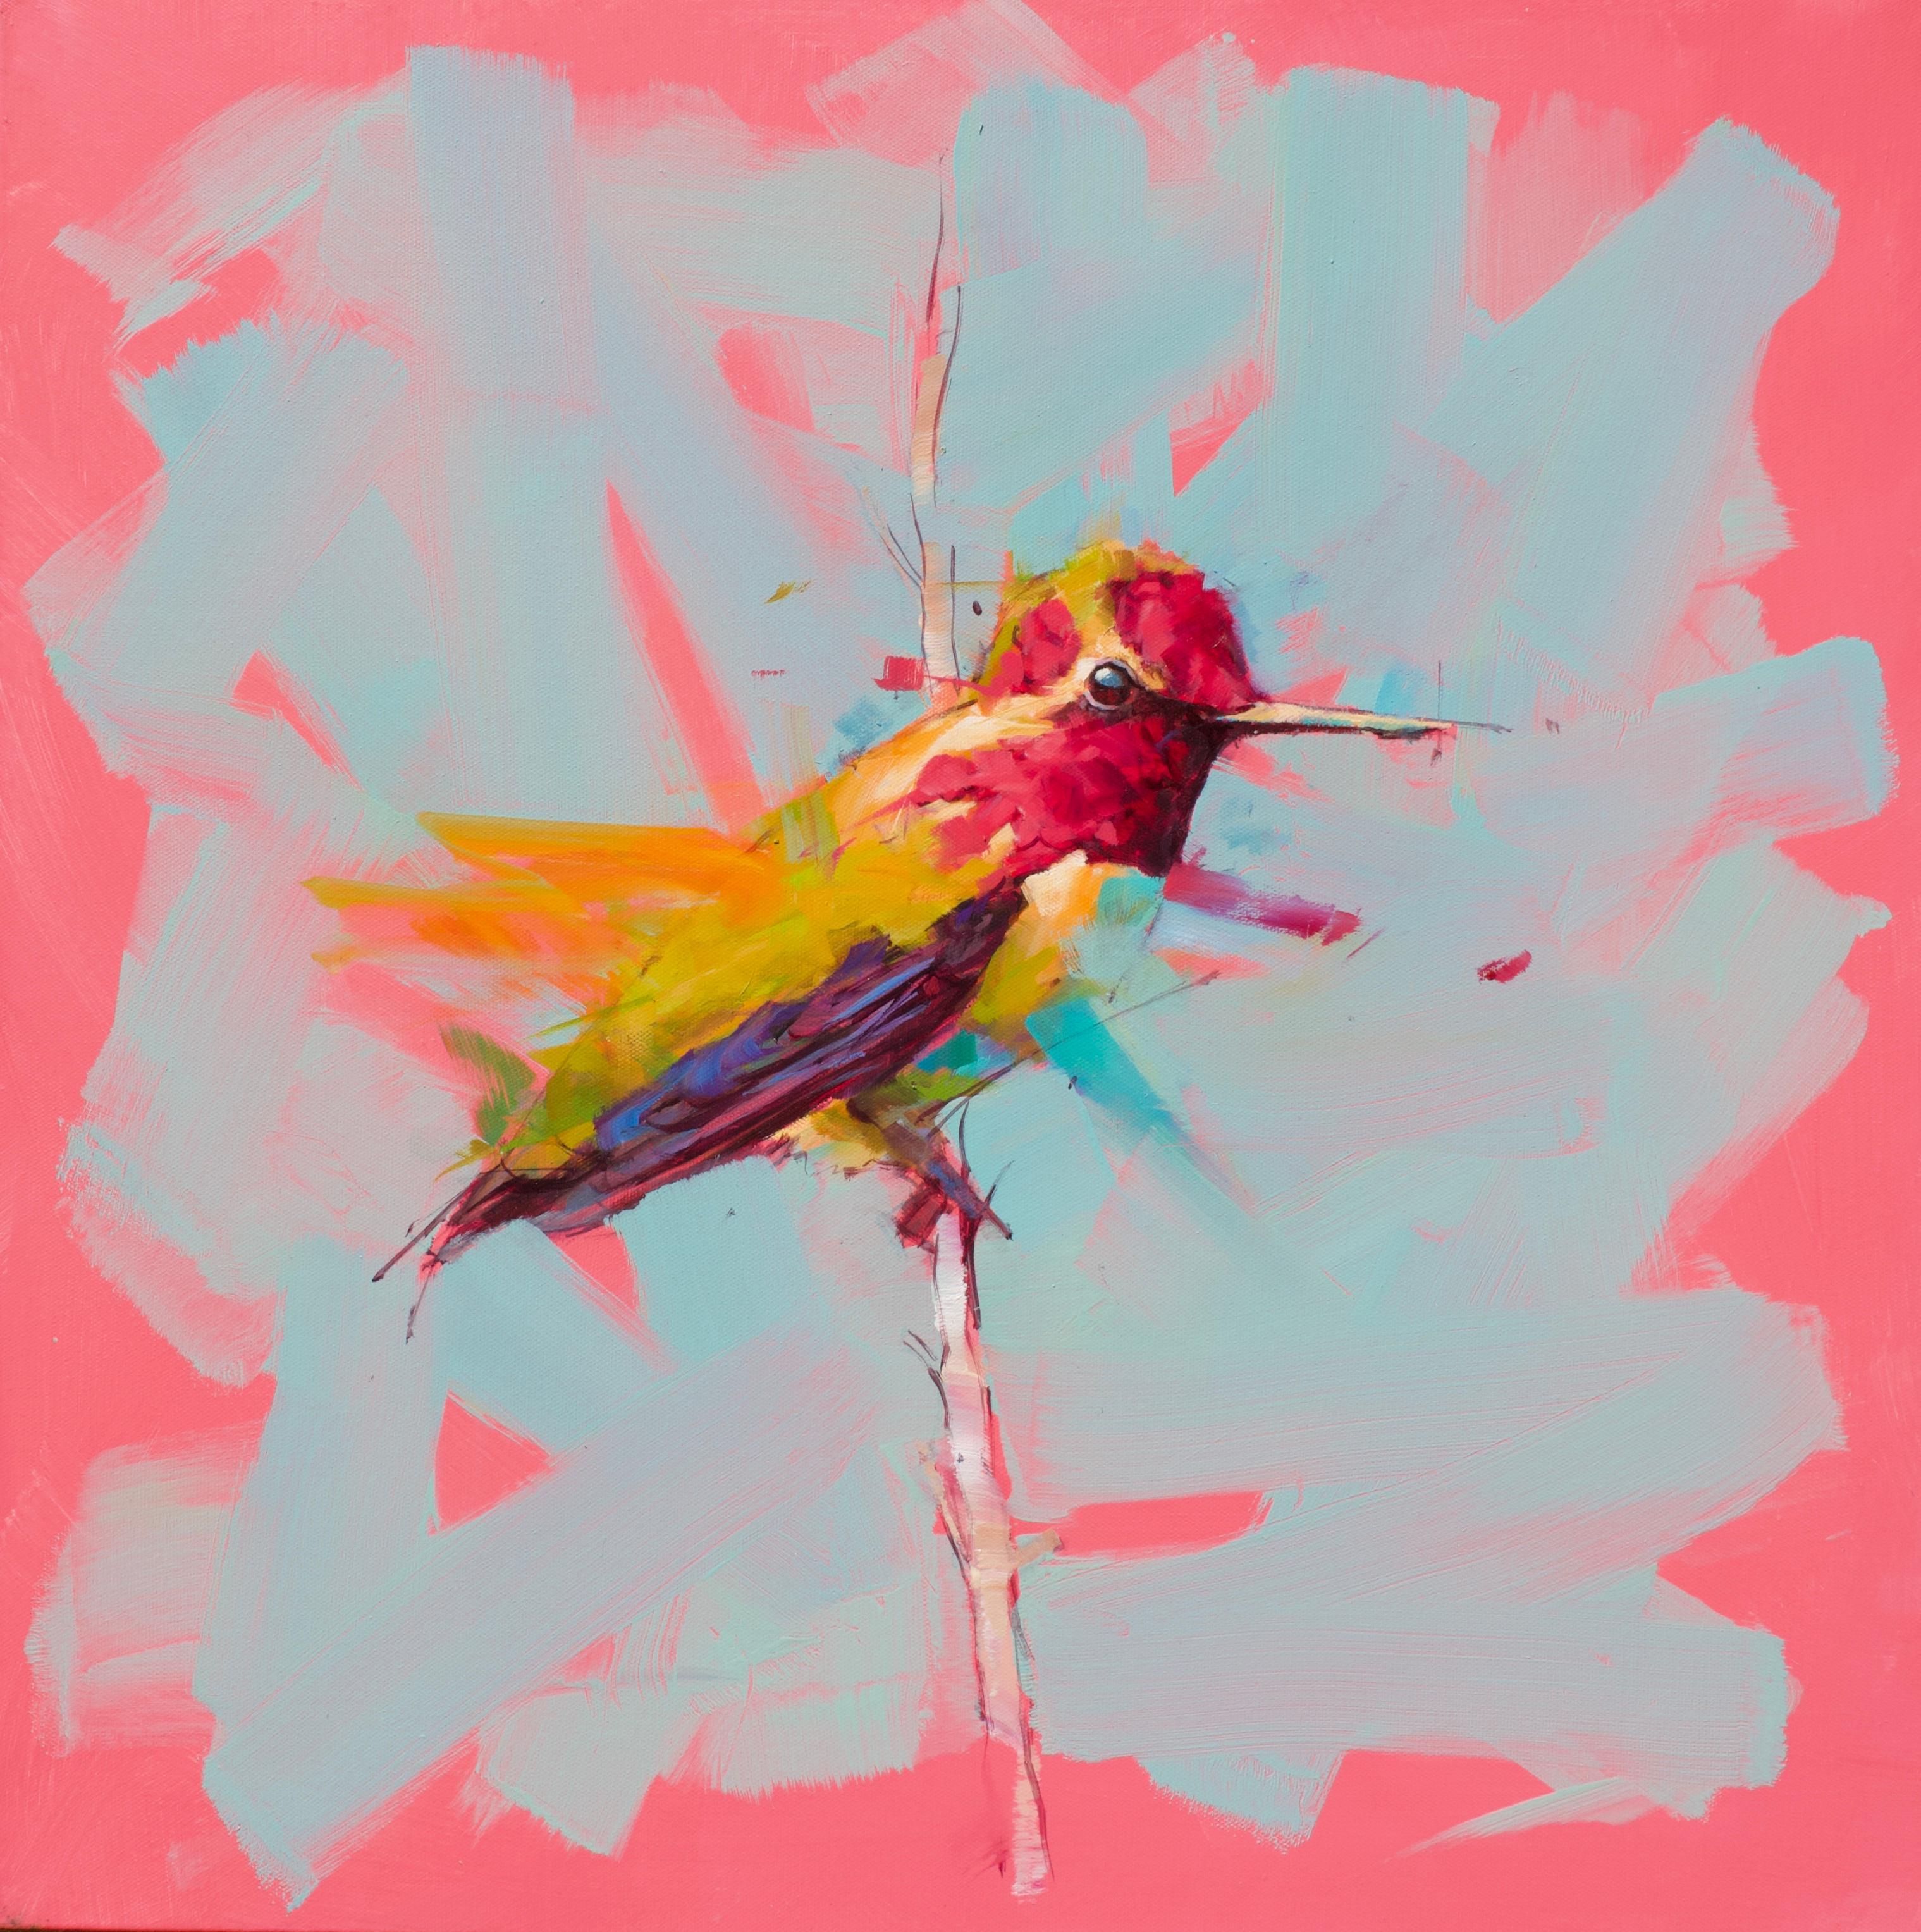 Humming Bird No.2- Pink - Oil painting by  English Artist Jamel Akib